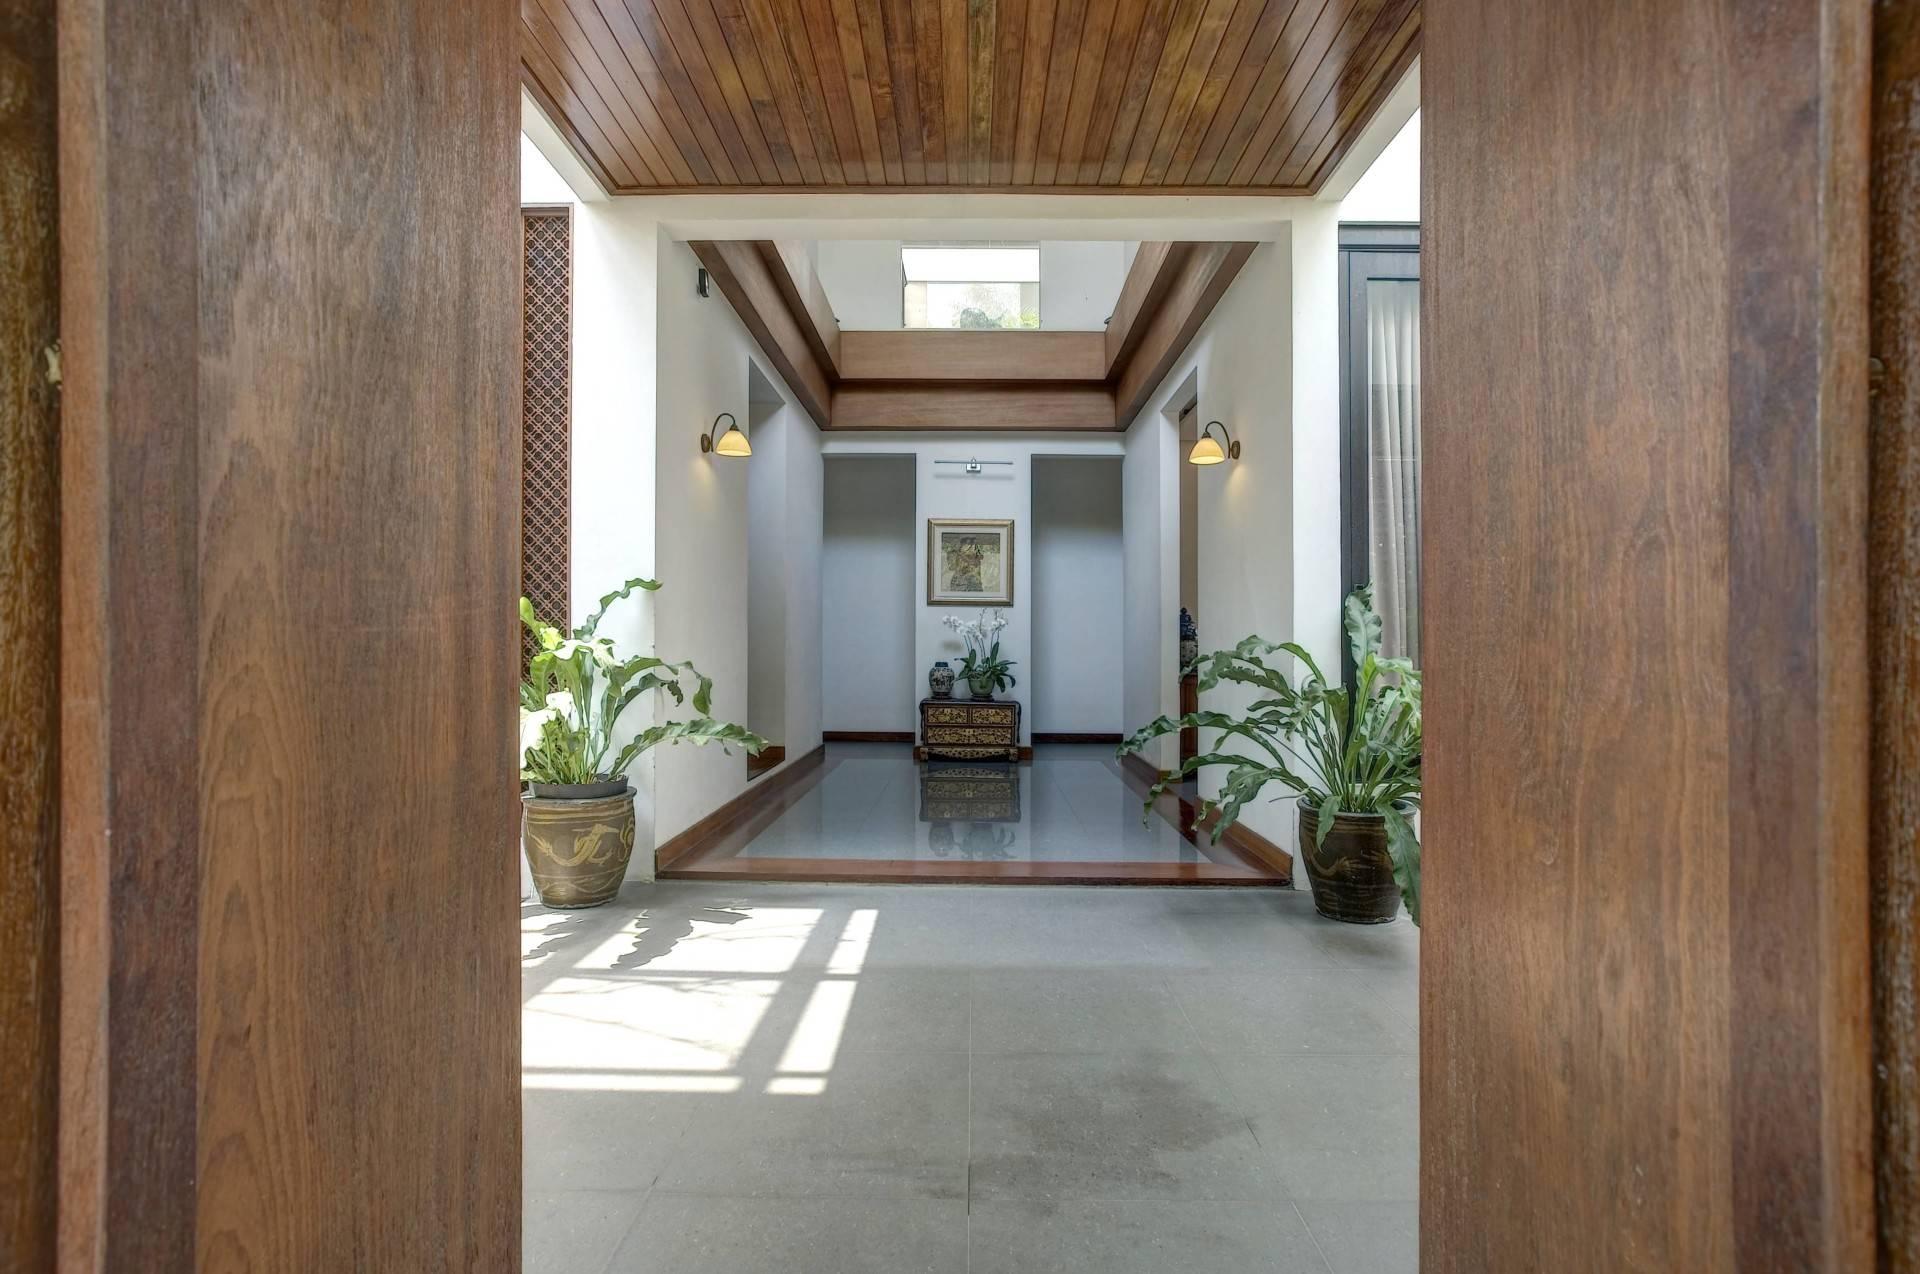 Raw Architecture Pangkalan Jati House Pangkalan Jati, Jakarta, Indonesia Pangkalan Jati, Jakarta, Indonesia Entrance Door Kontemporer  1564